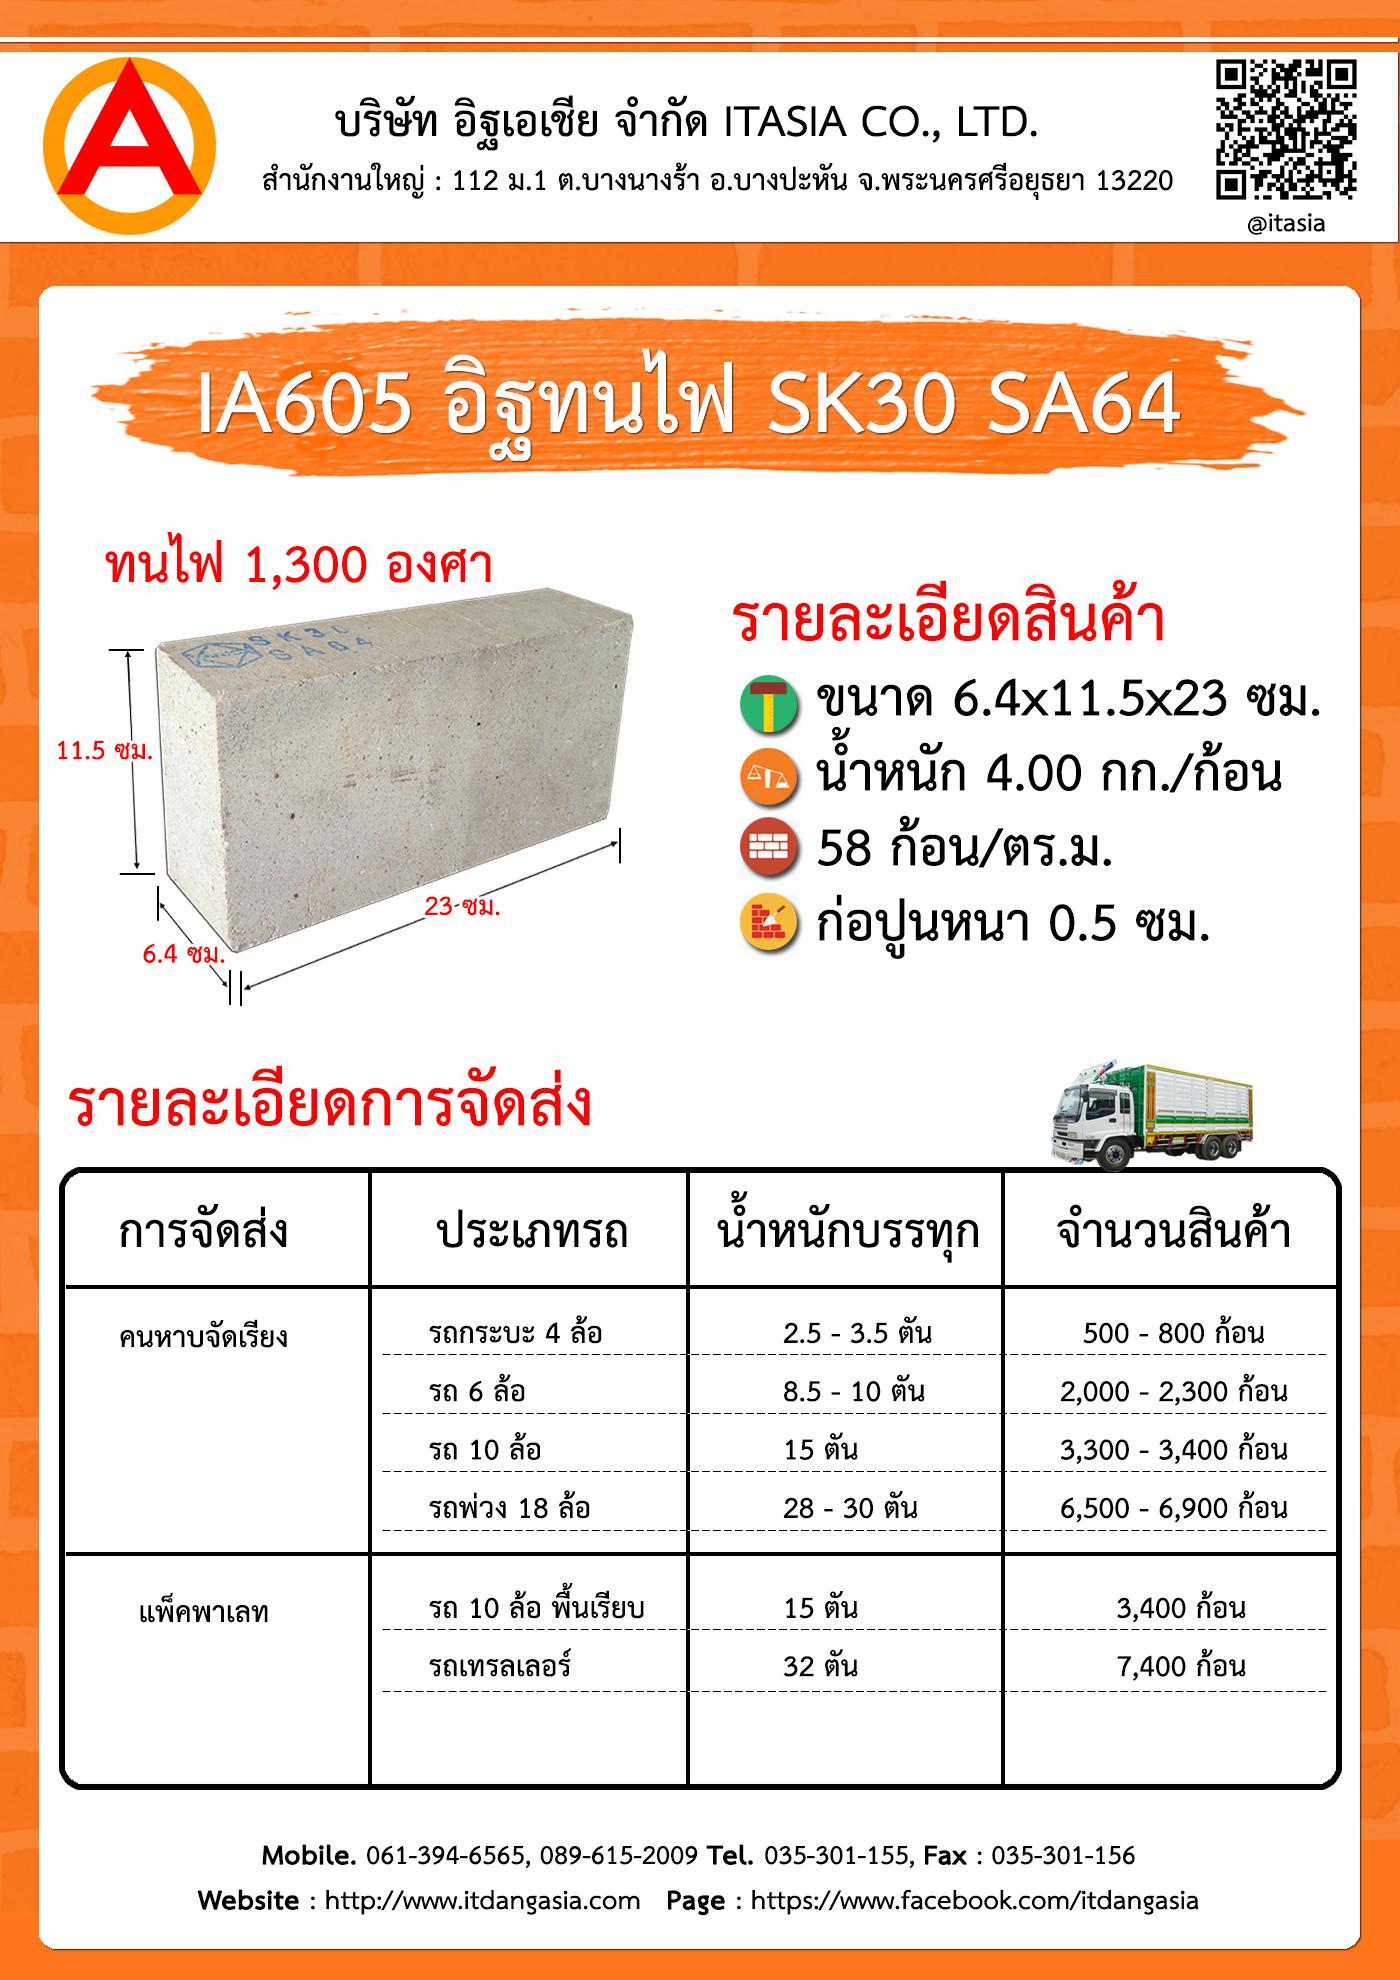 IA605 อิฐทนไฟ SK30 SA70 ขนาด 6.4X11.5X23 ซม.